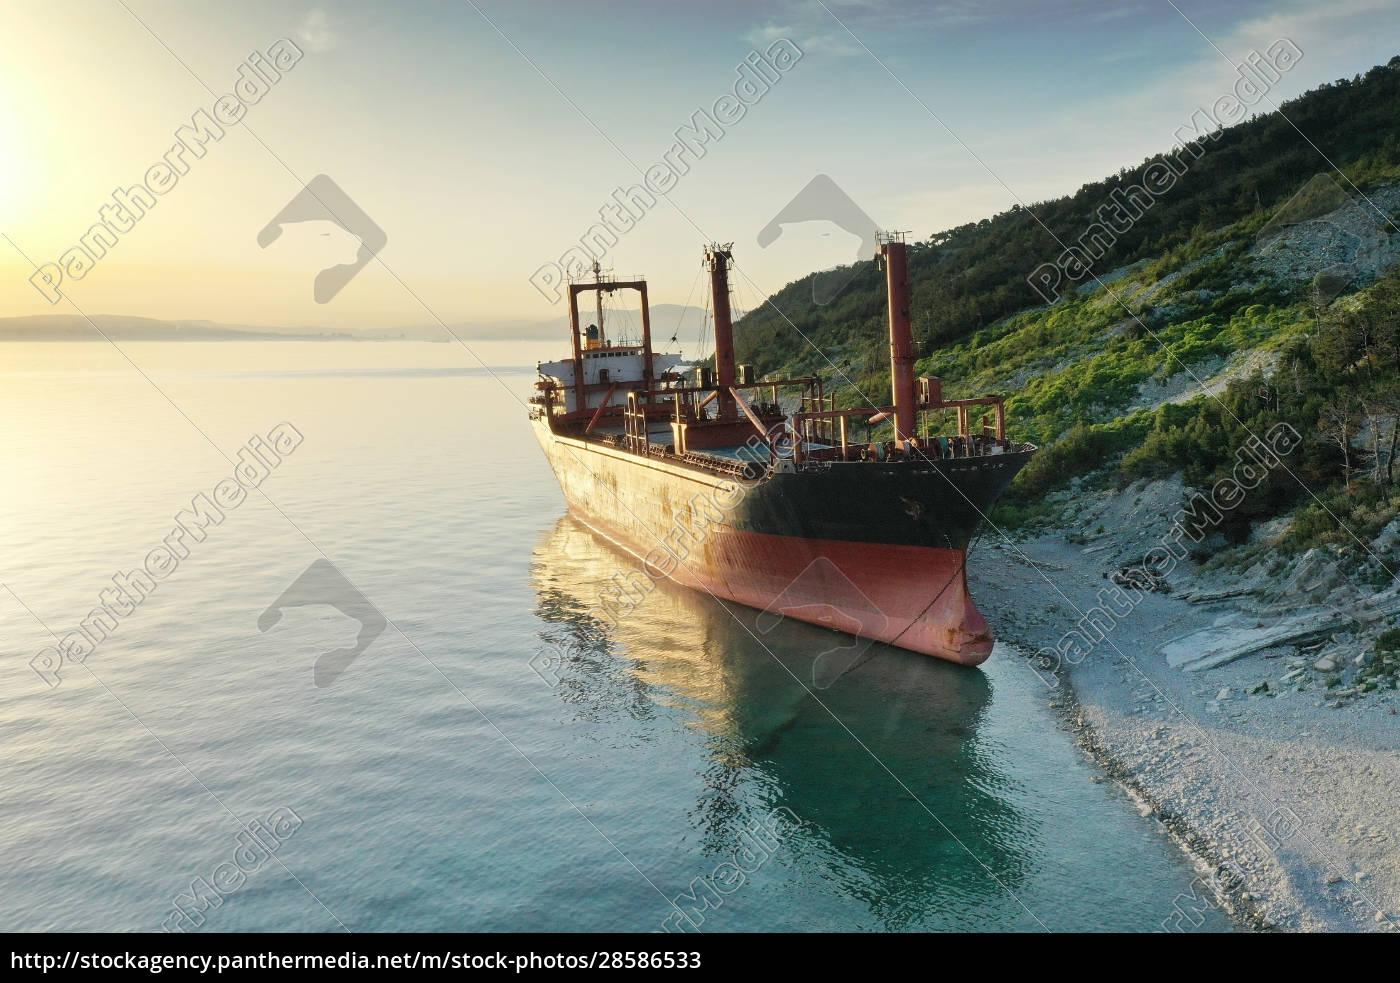 shipwreck., dry, cargo, ship, left, on - 28586533